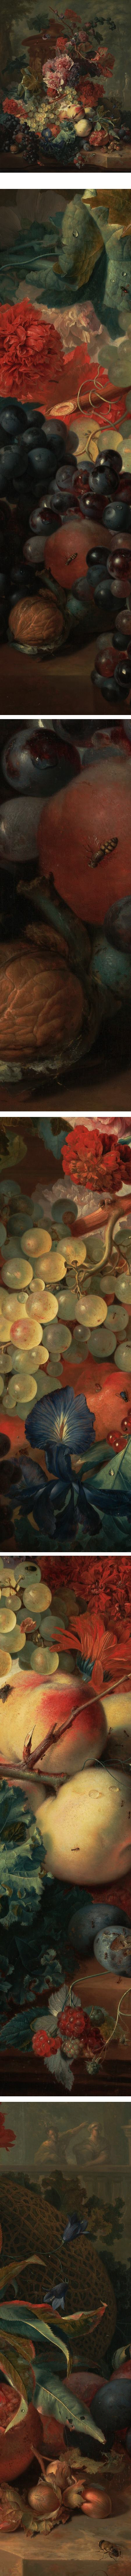 Fruit Piece, Jan van Huysu, highly detailed 18th century Dutch still life